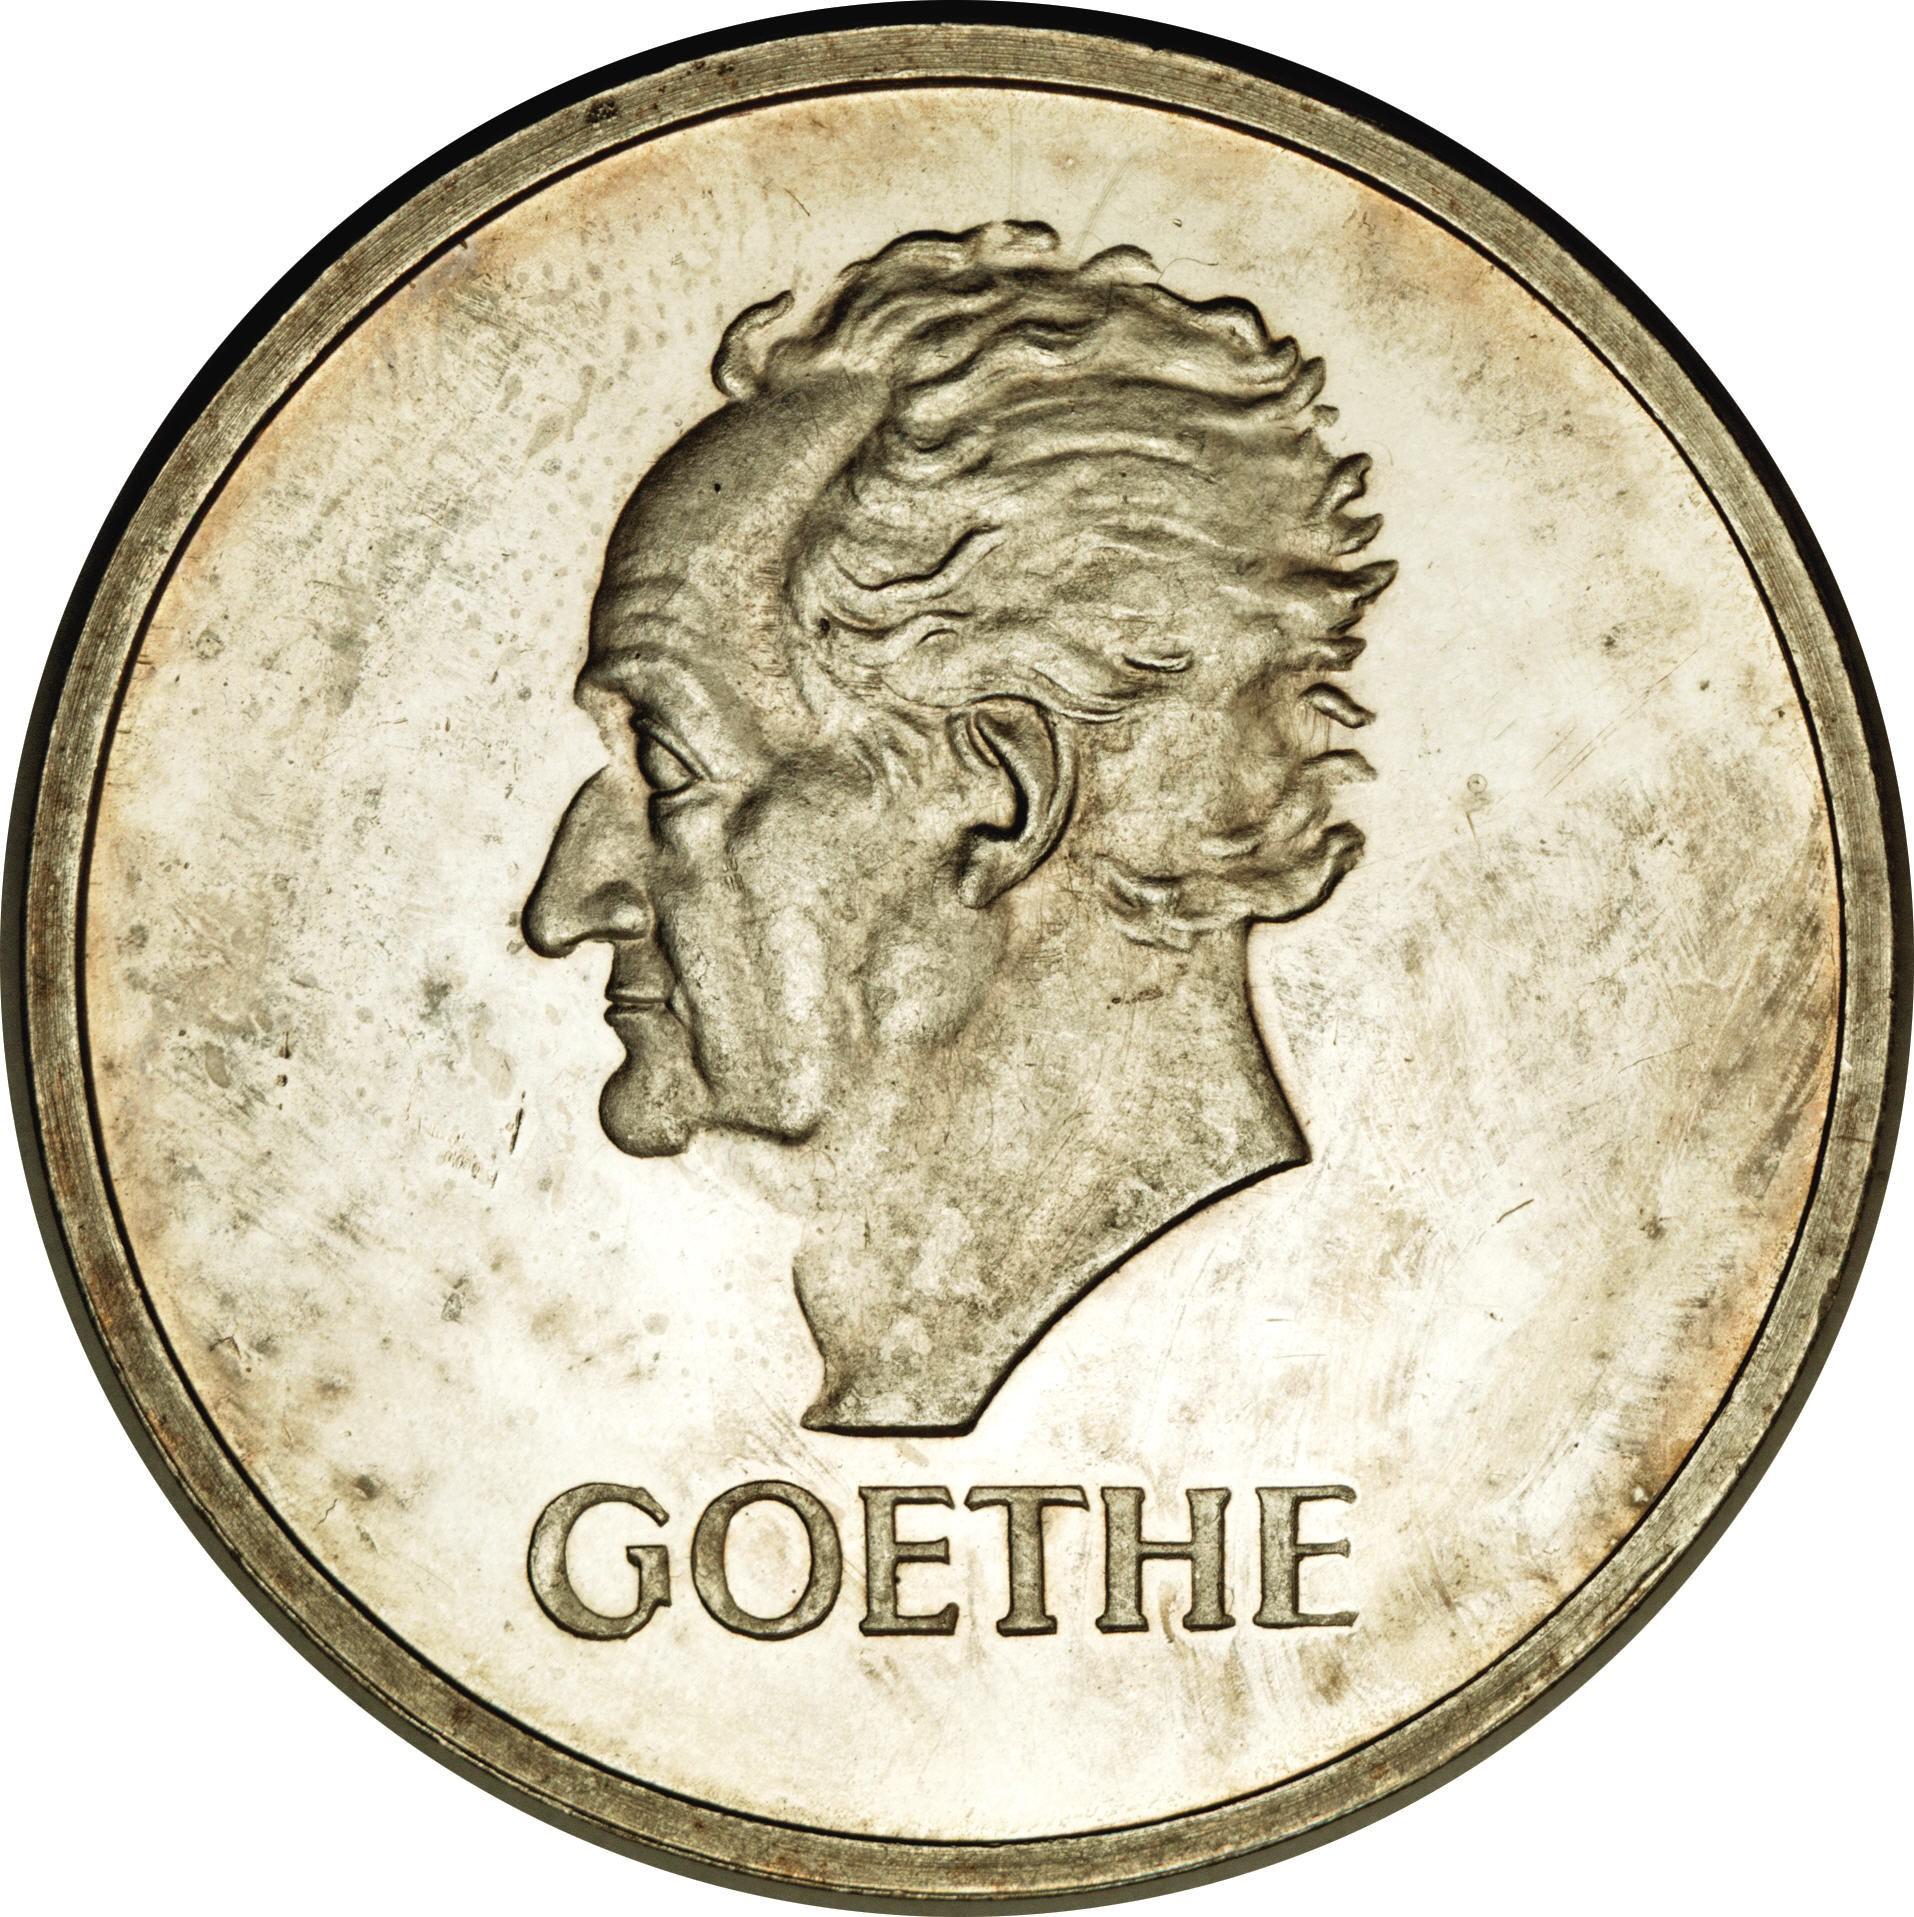 Germany 5 Reichsmark (1932 Goethe)